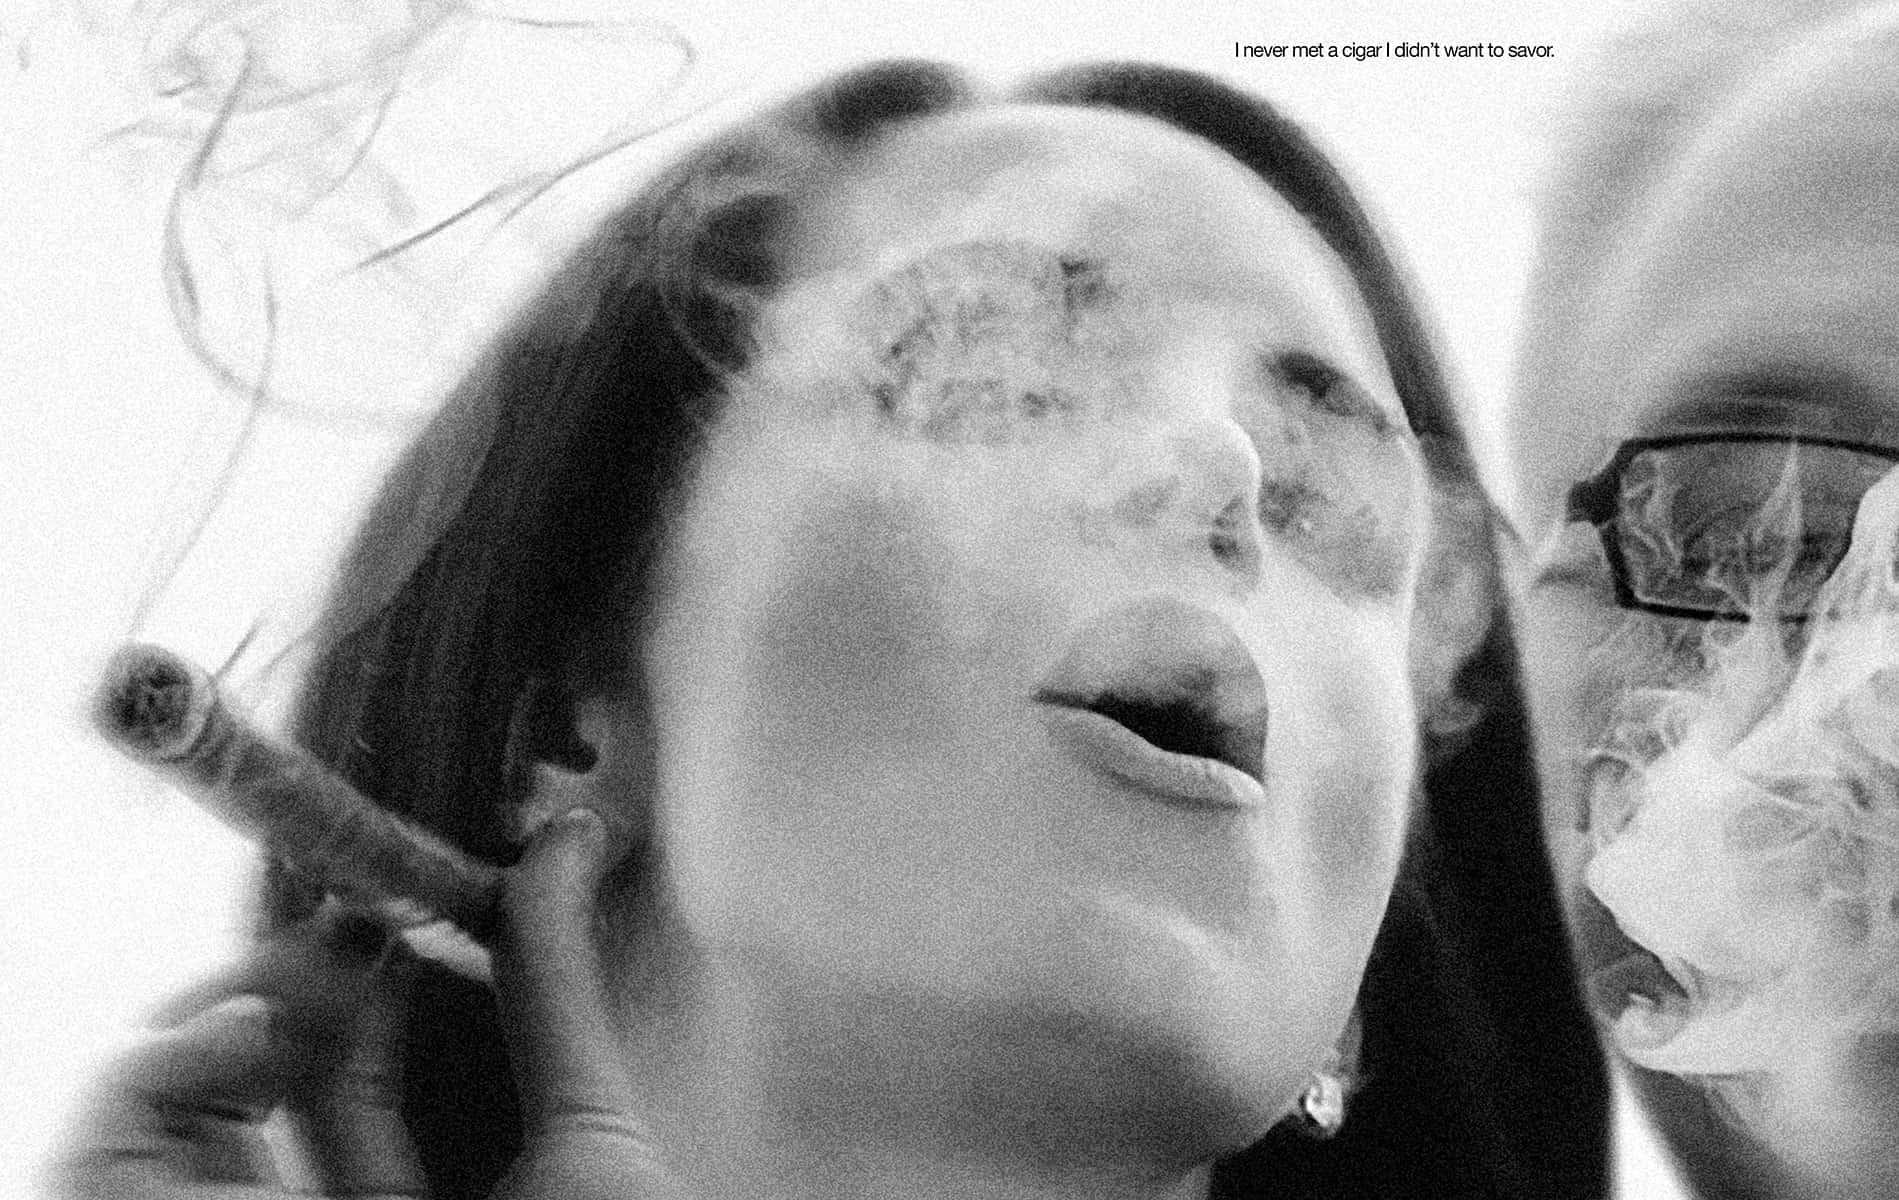 53Tom_I never met a cigar